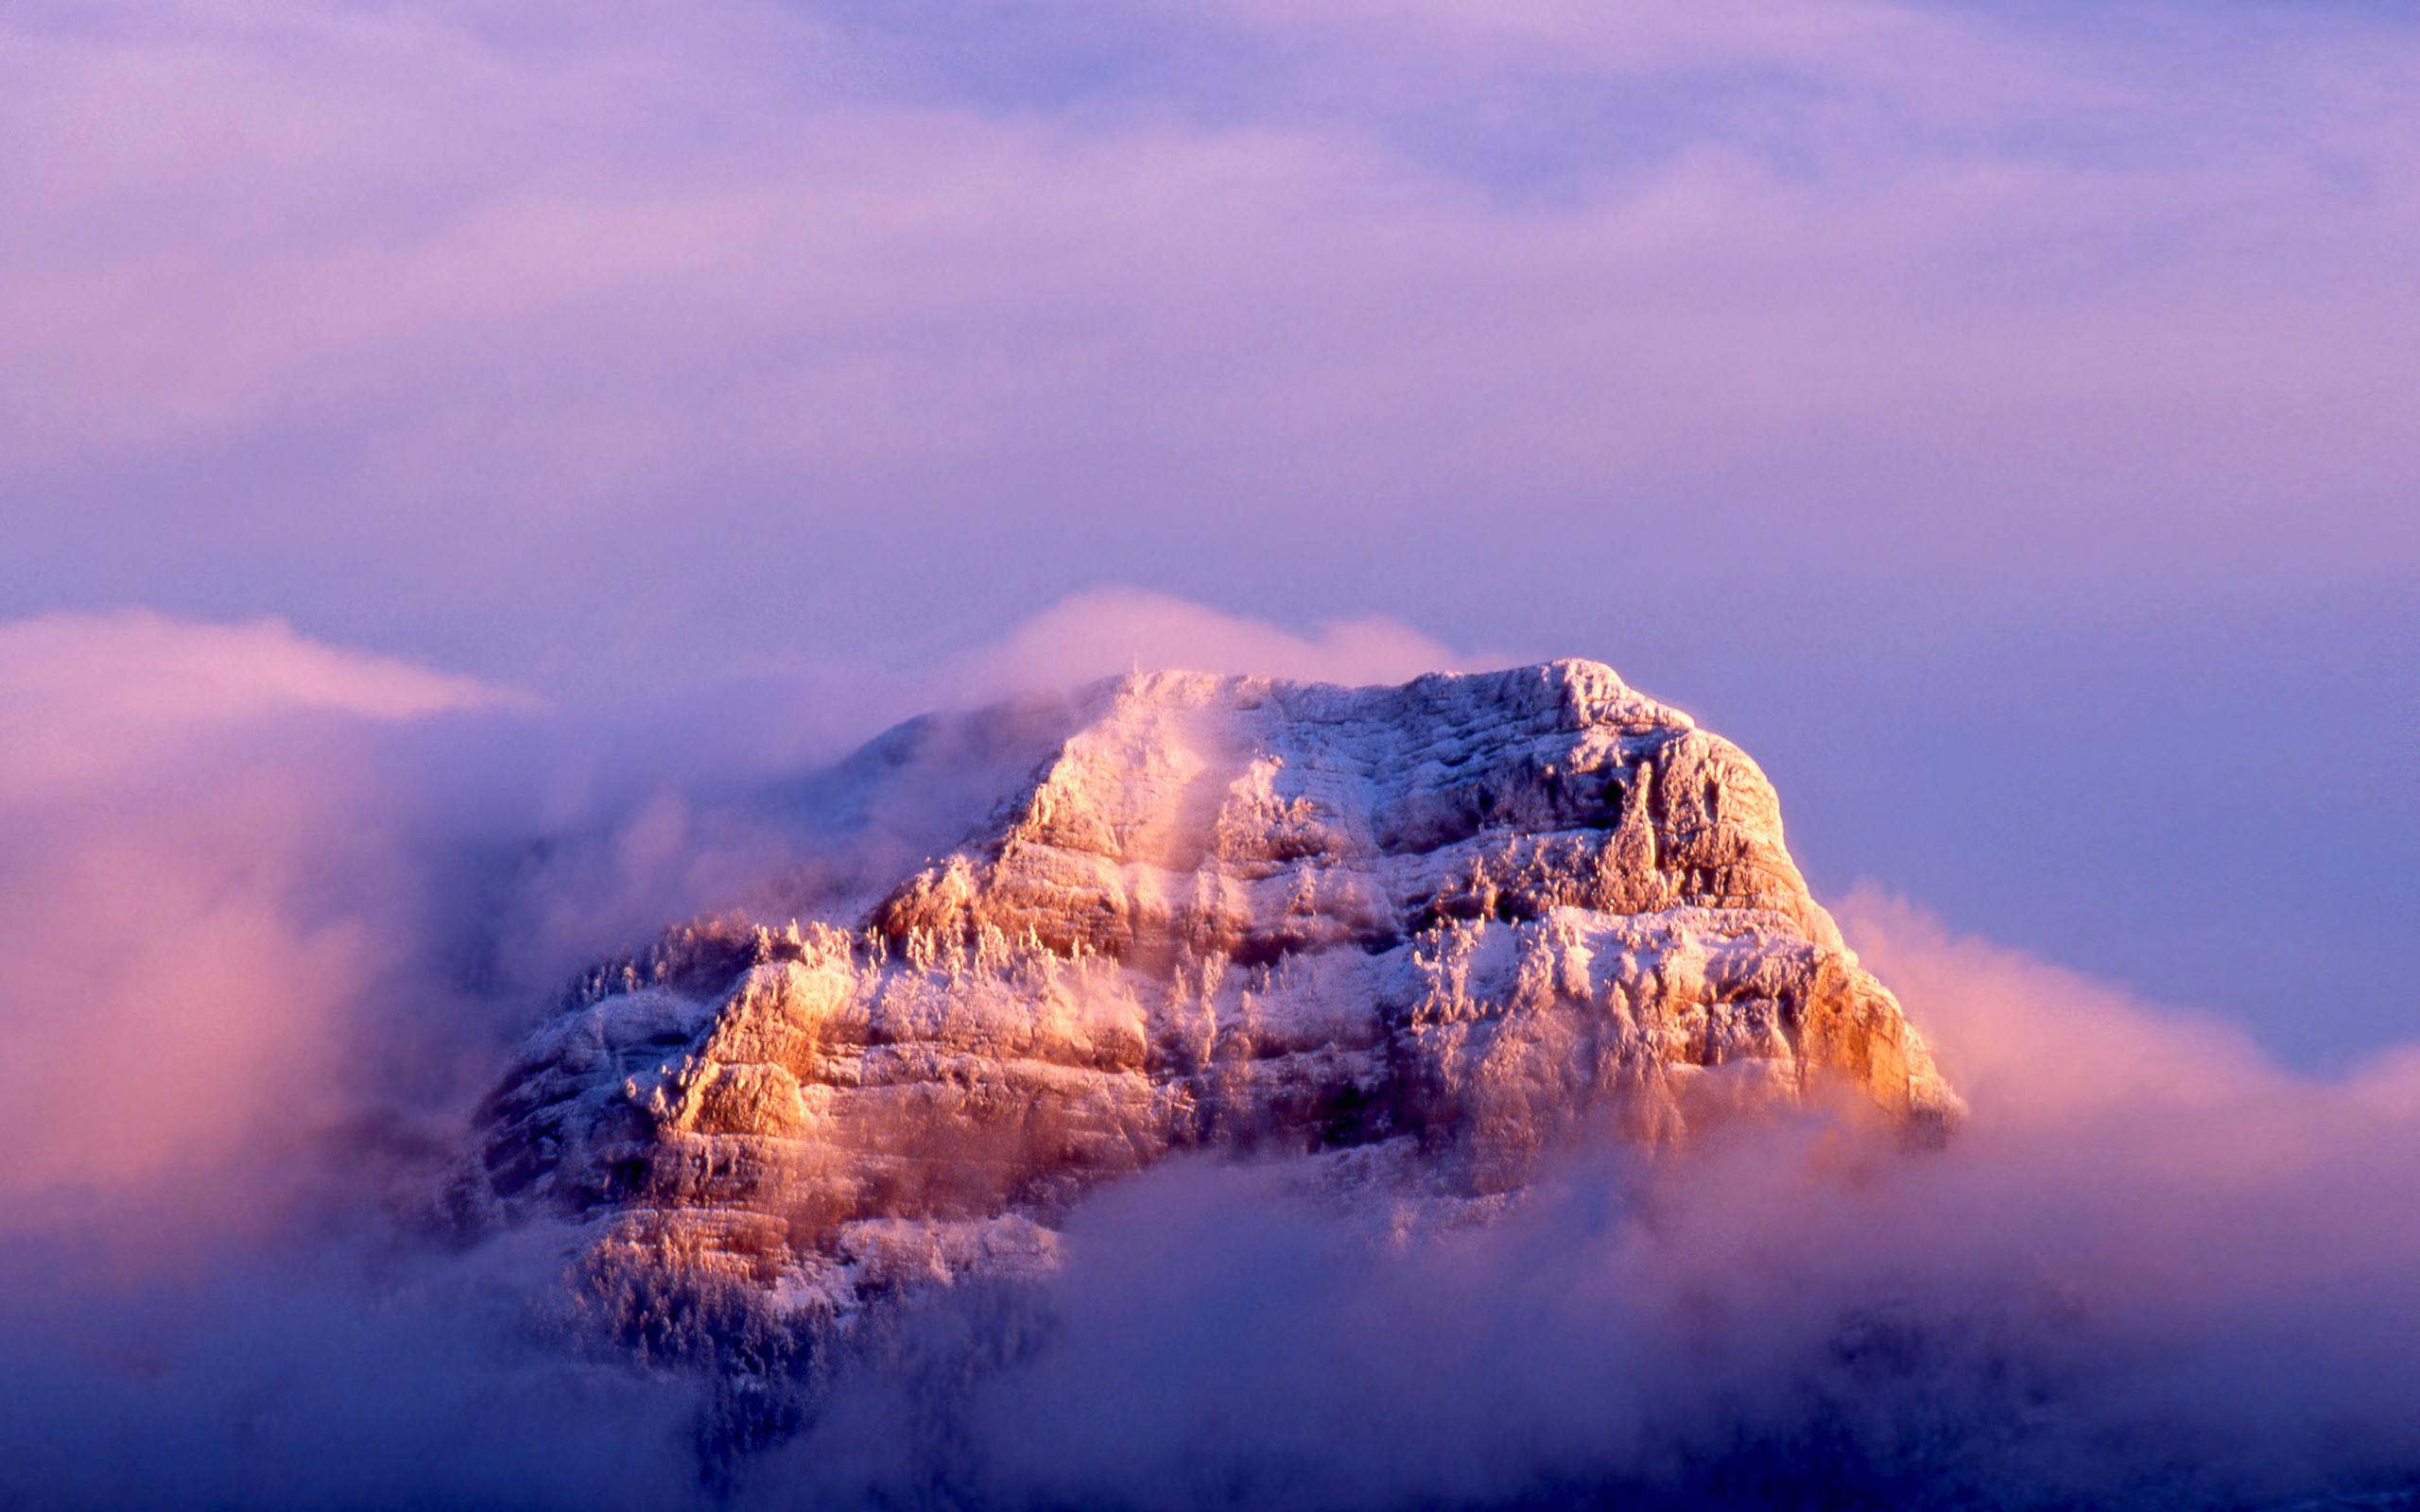 Mac Os X Snow Leopard Wallpapers 2560x1600 1247253